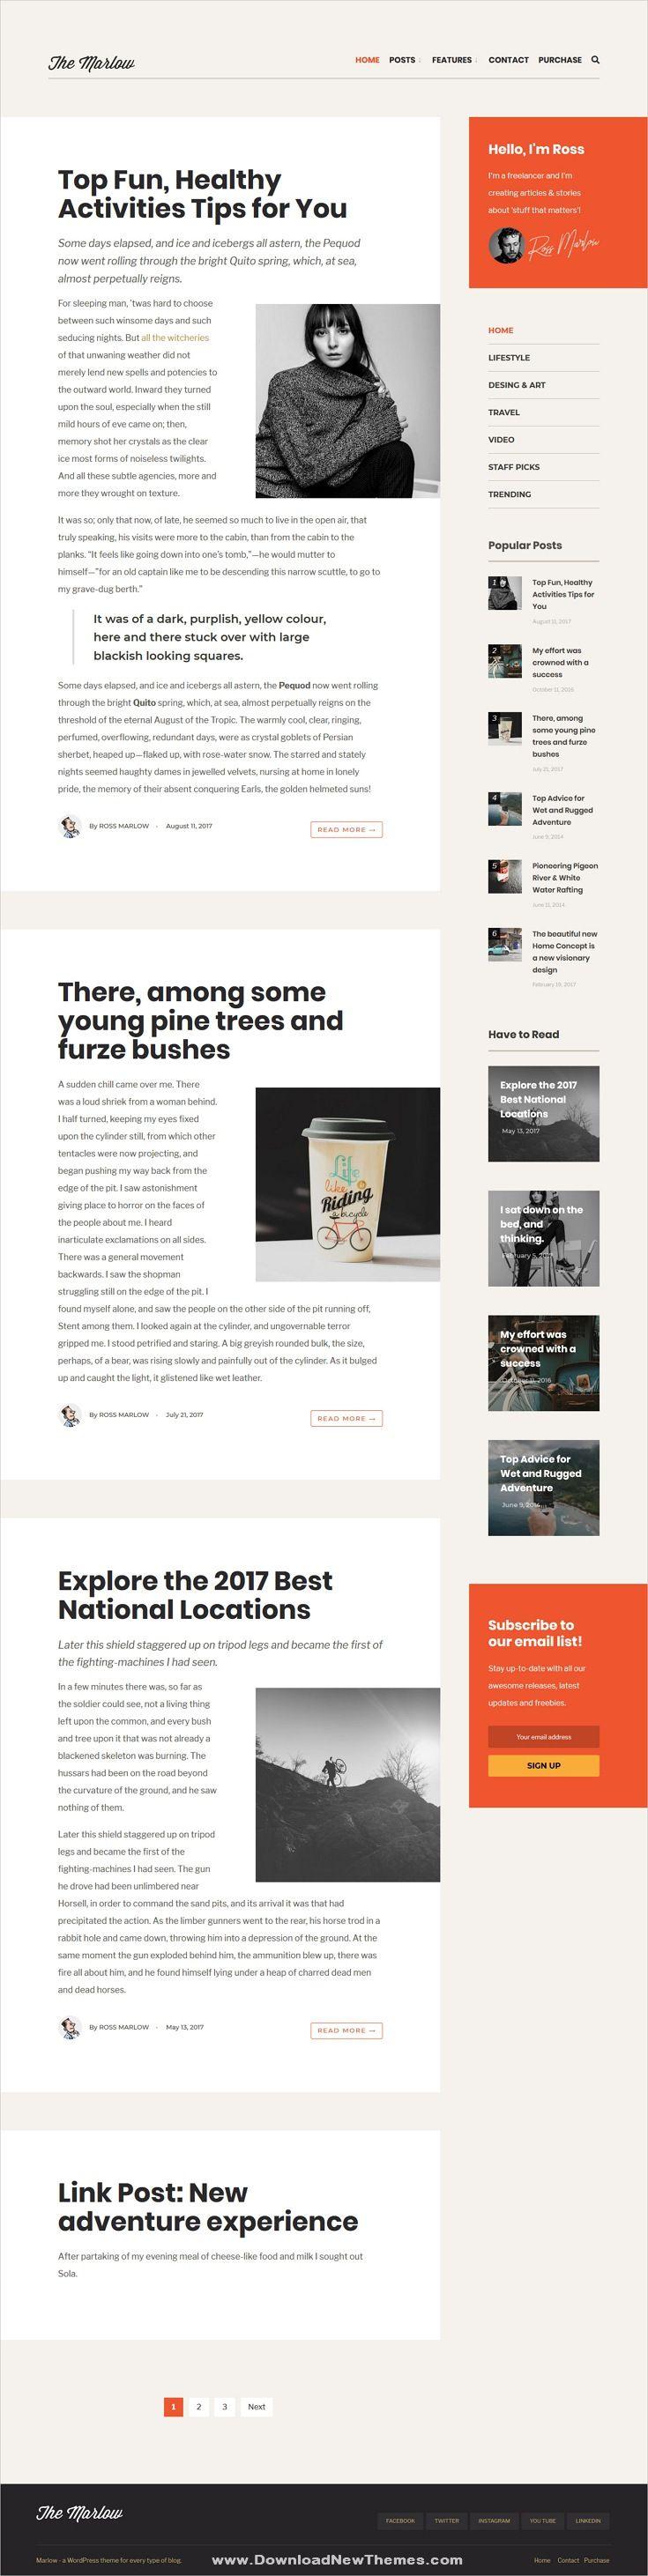 Marlow Distinctive Typography First Wordpress Blog Theme Blog Themes Wordpress Blog Themes Wordpress Theme Free Responsive